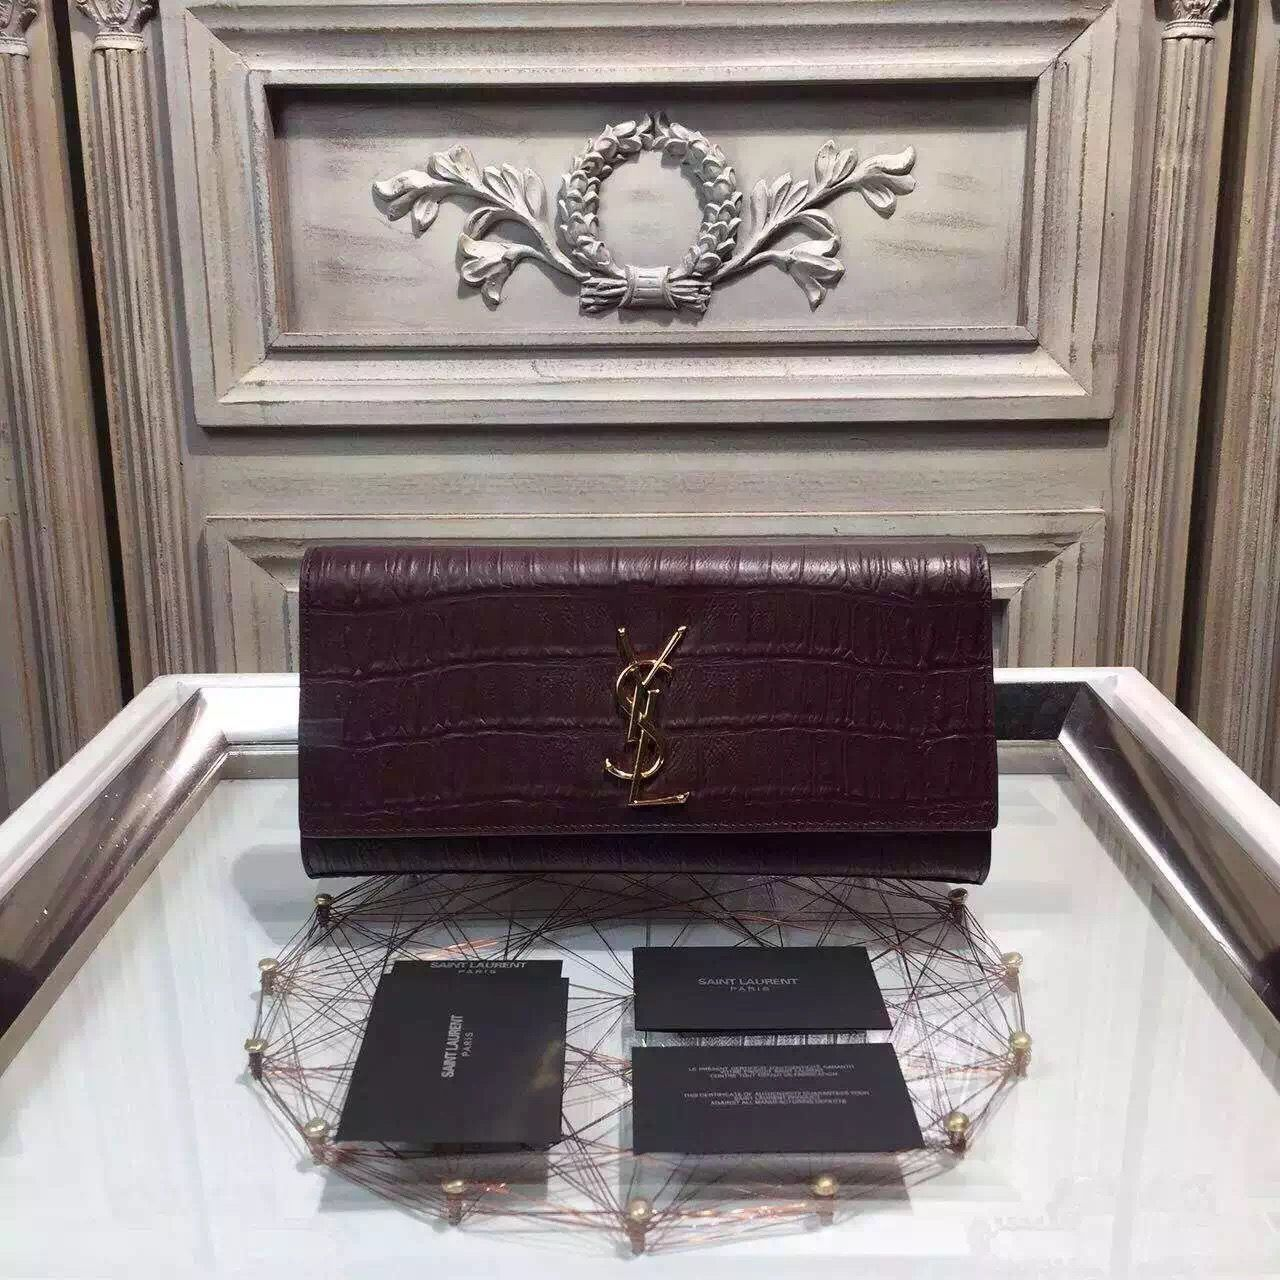 dc9e30e37d0 Saint Laurent 326079 Classic Monogram Clutch in Burgundy Crocodile Embossed  Leather